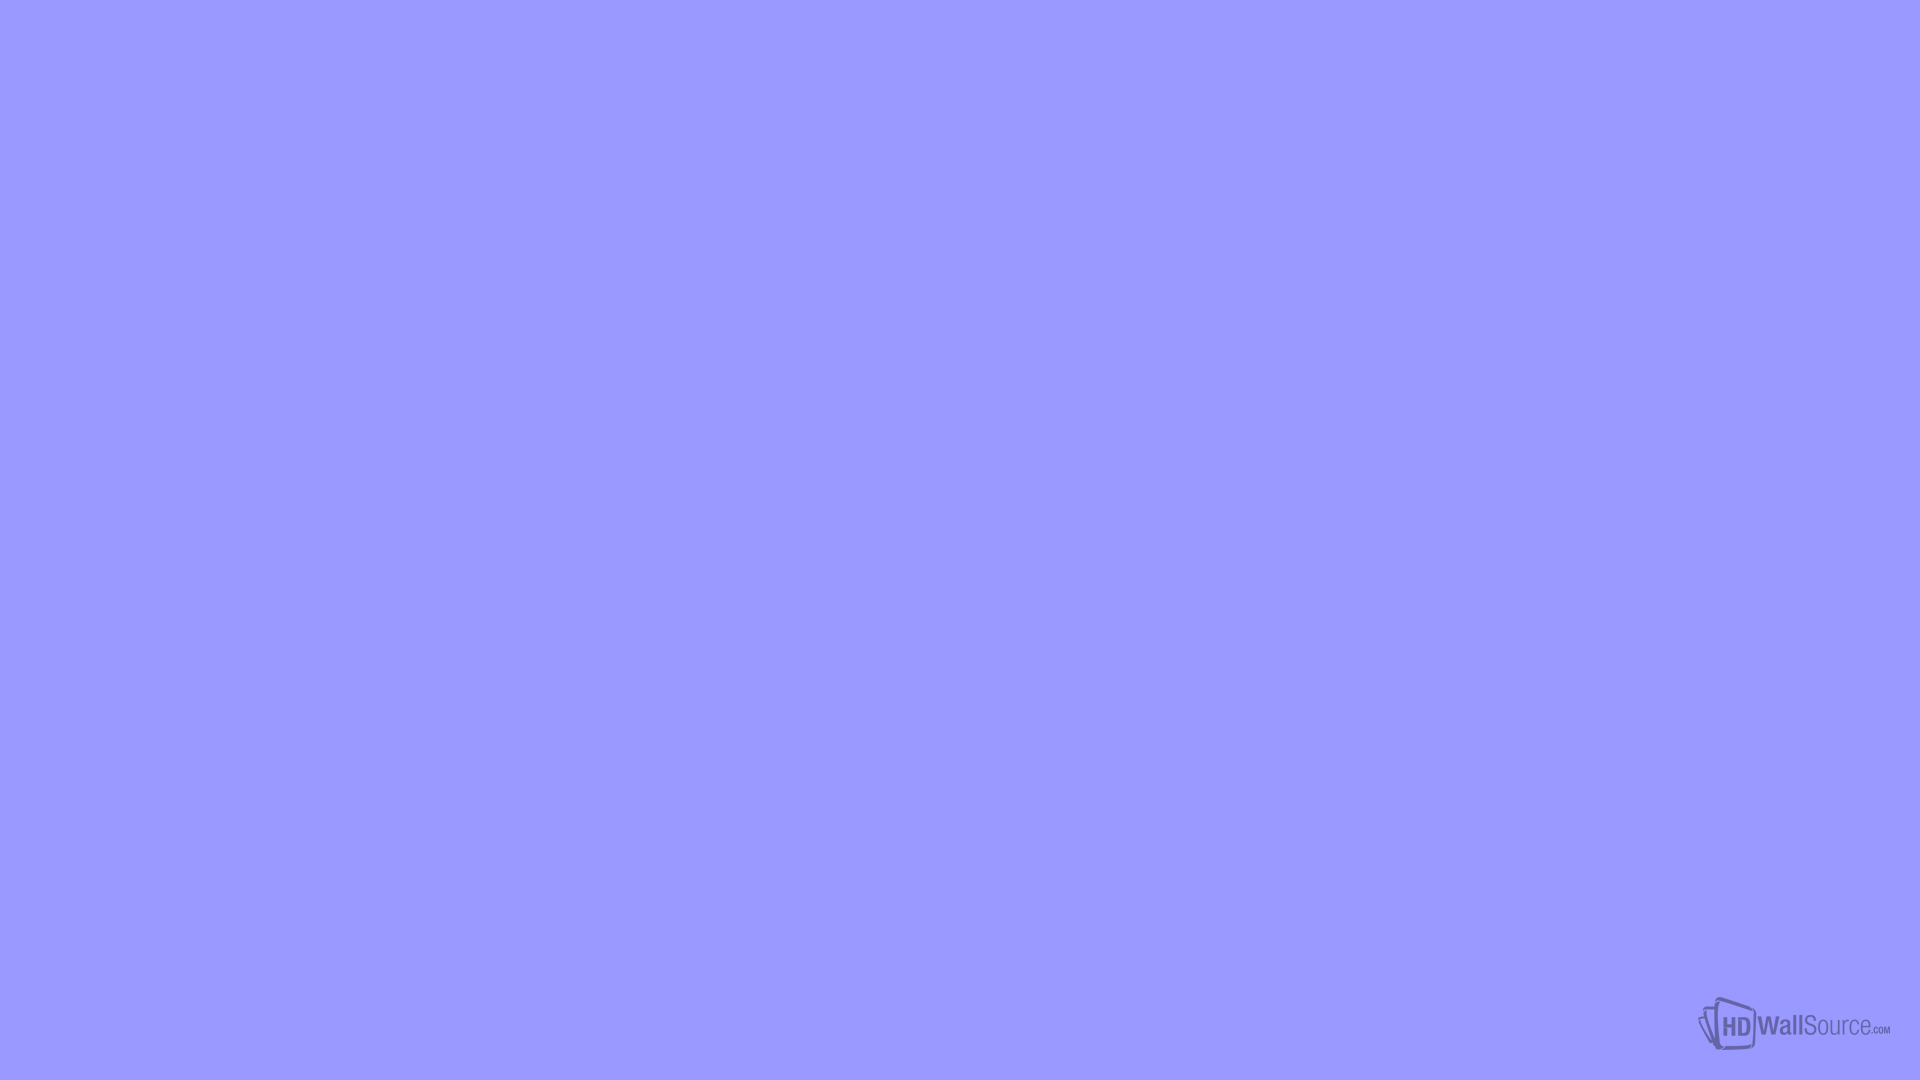 9999ff wallpaper 71070